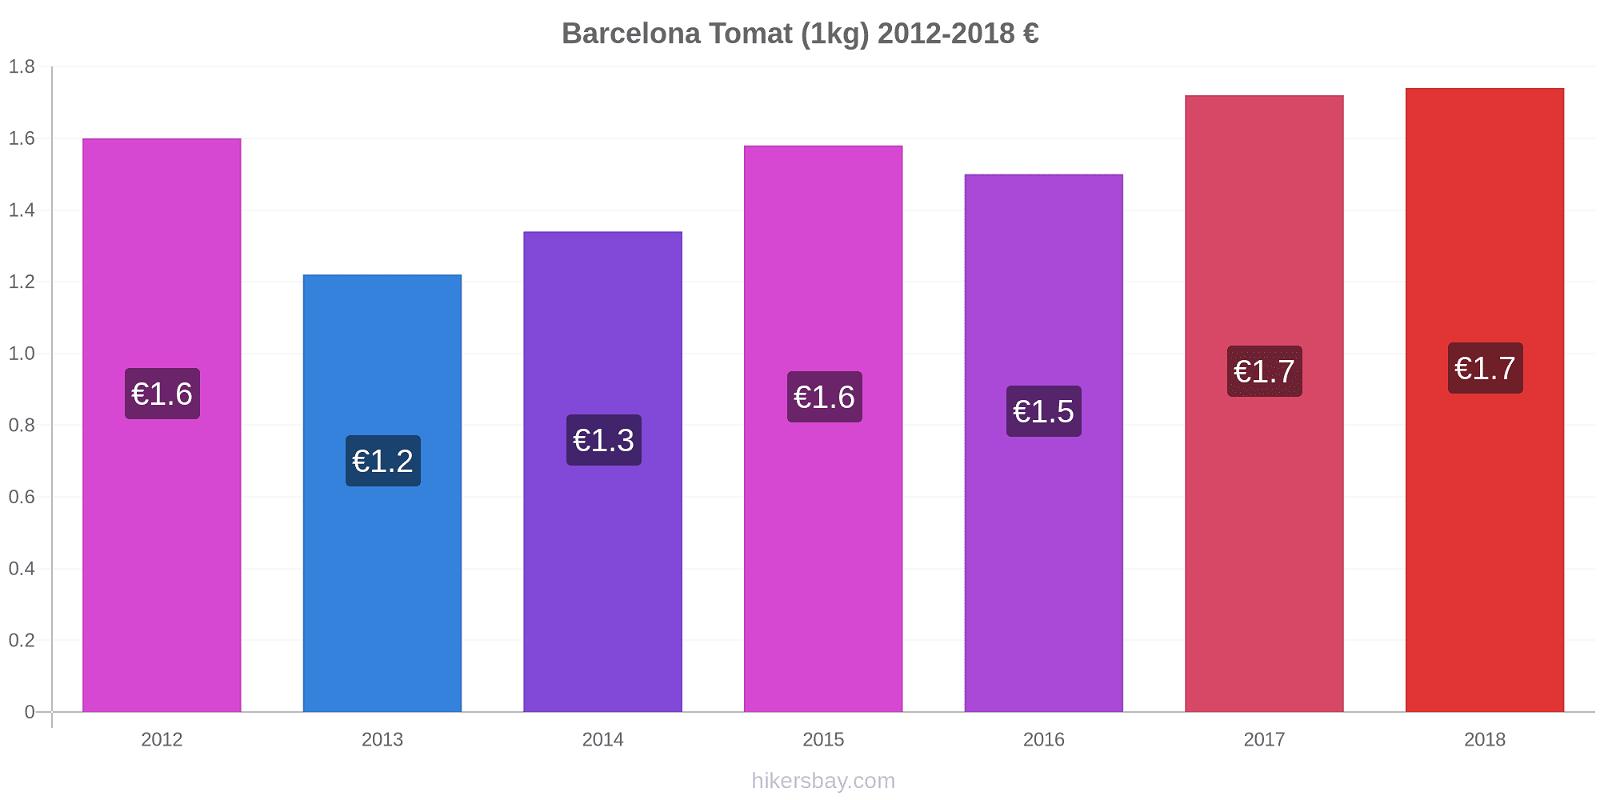 Barcelona prisendringer Tomat (1kg) hikersbay.com